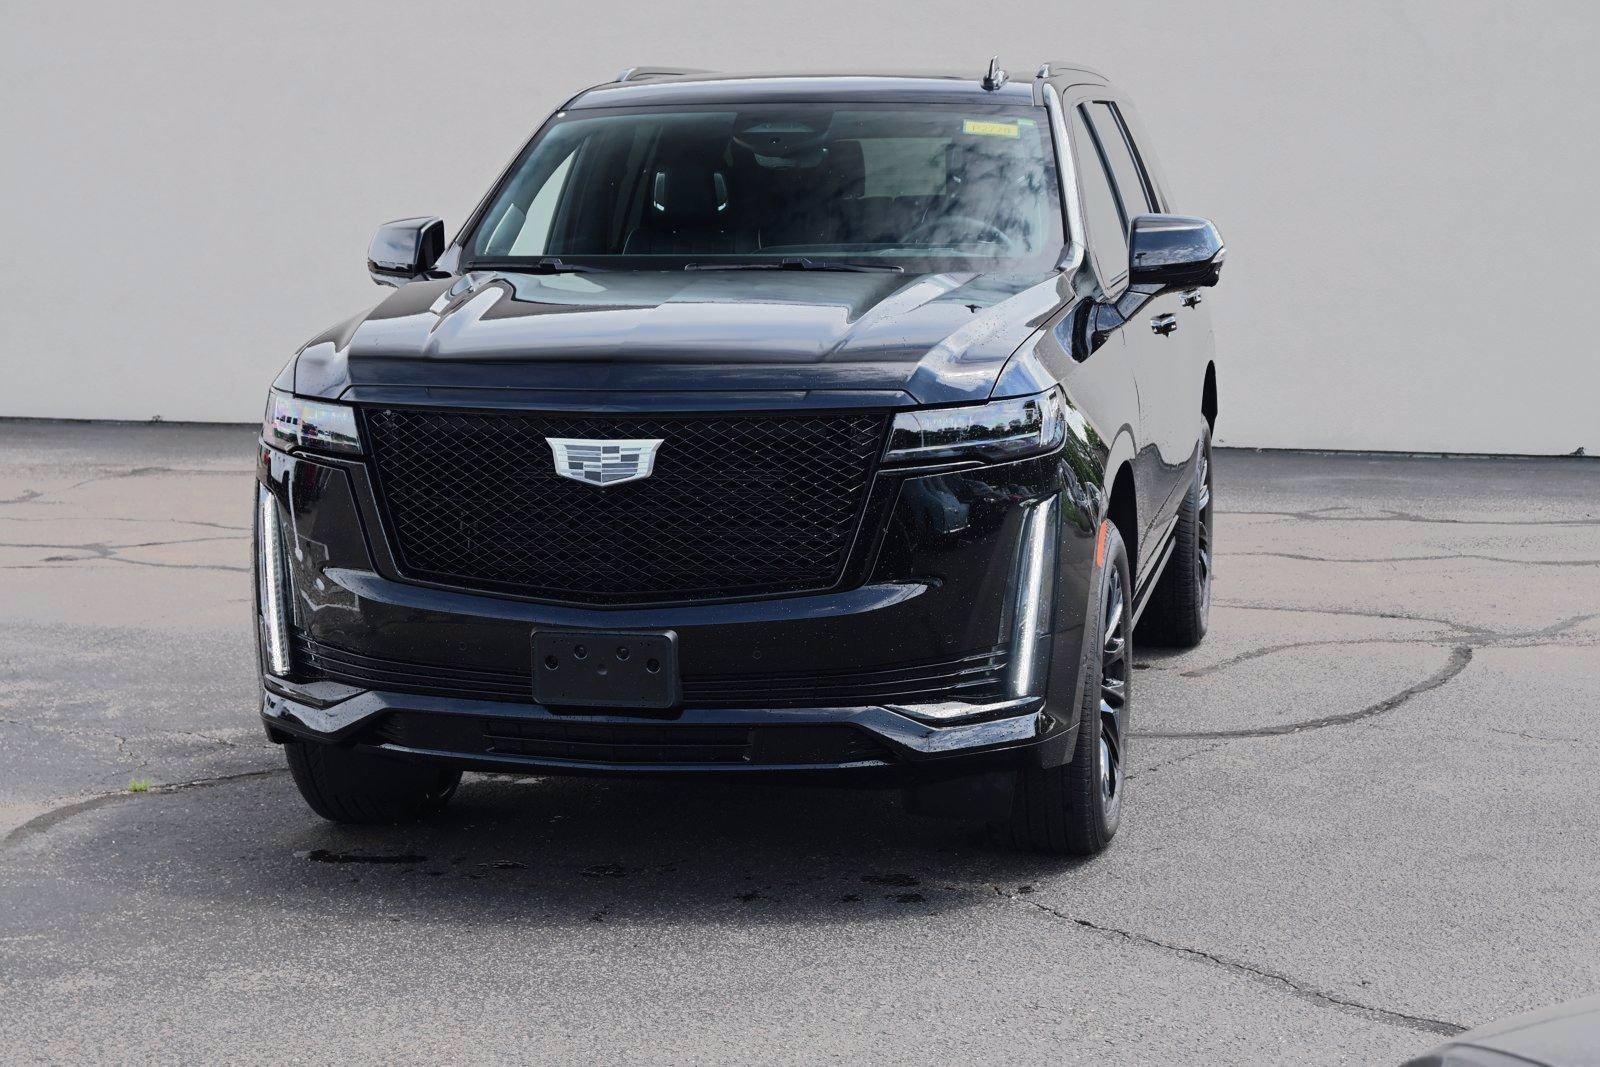 2021 Cadillac Escalade Vehicle Photo in Norwood, MA 02062